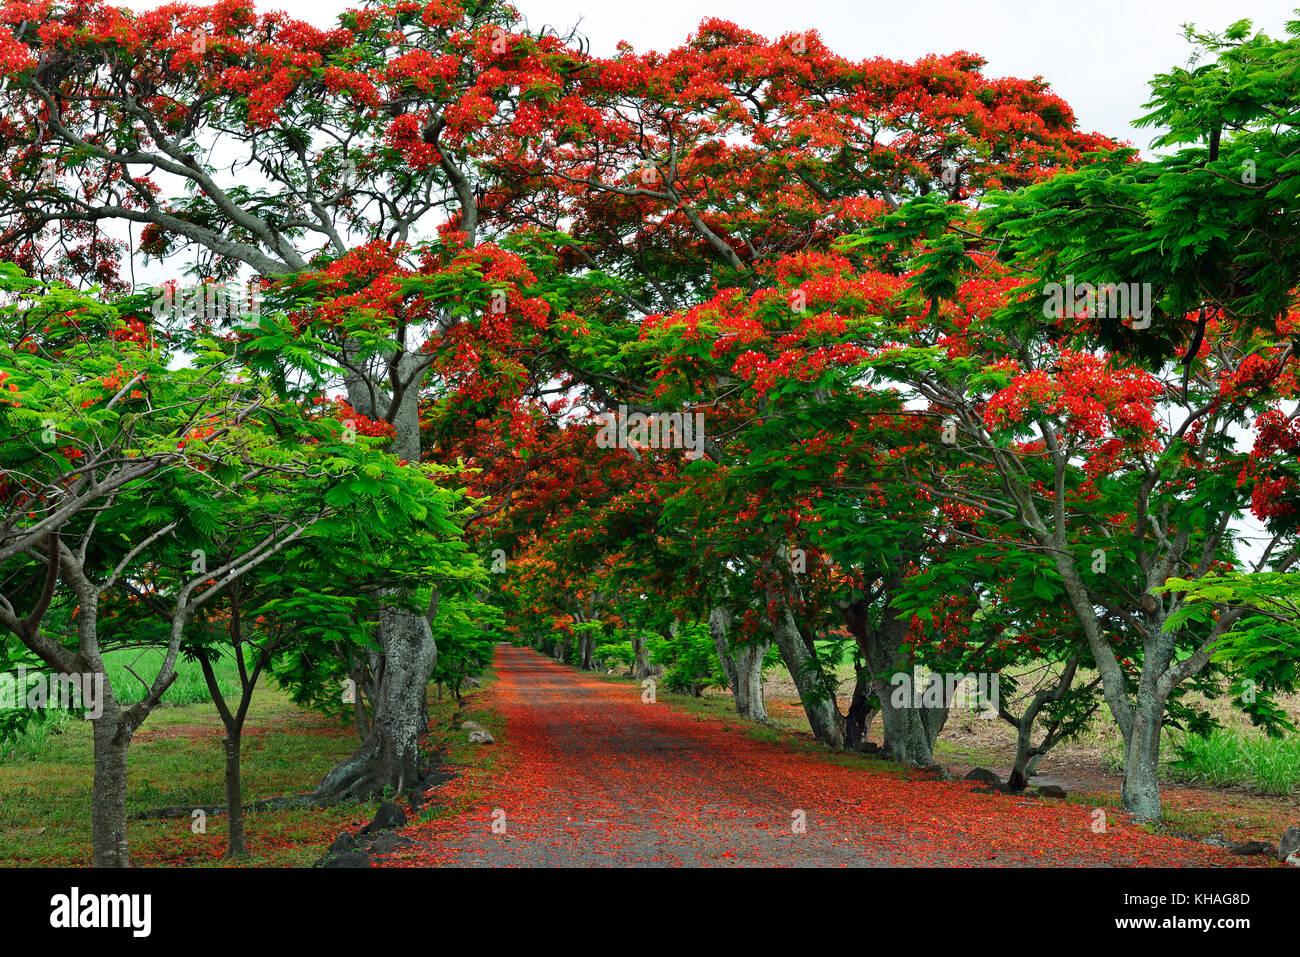 Avenue with Royal Poincianasn, Flamboyant (Delonix regia), Mauritius - Stock Image